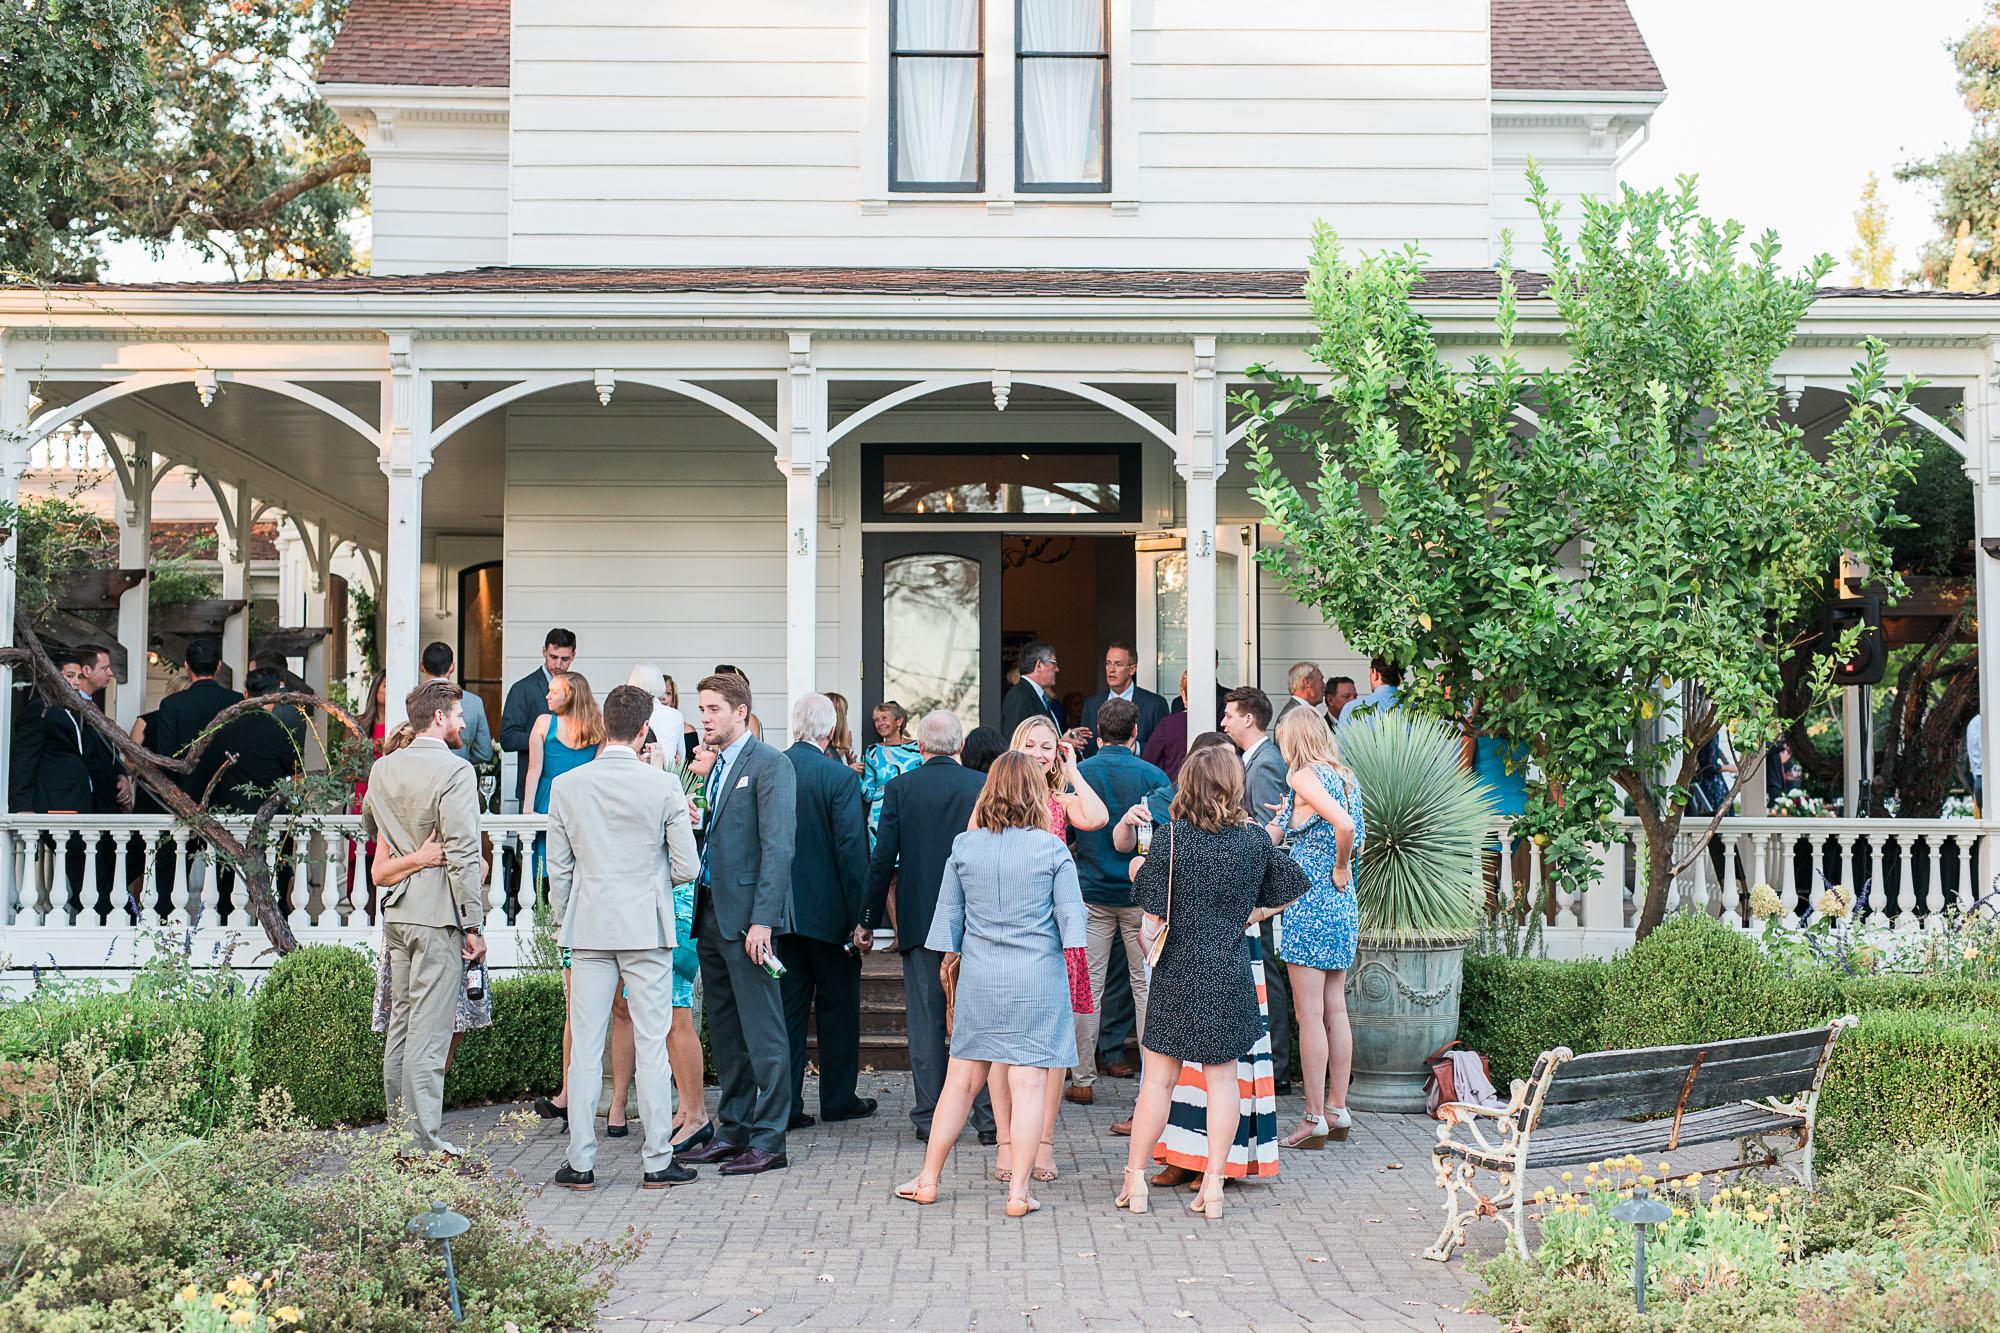 Generals+Daughter+Wedding+Photos+by+JBJ+Pictures+-+Ramekins+Wedding+Venue+Photographer+in+Sonoma+Napa+(35).jpg